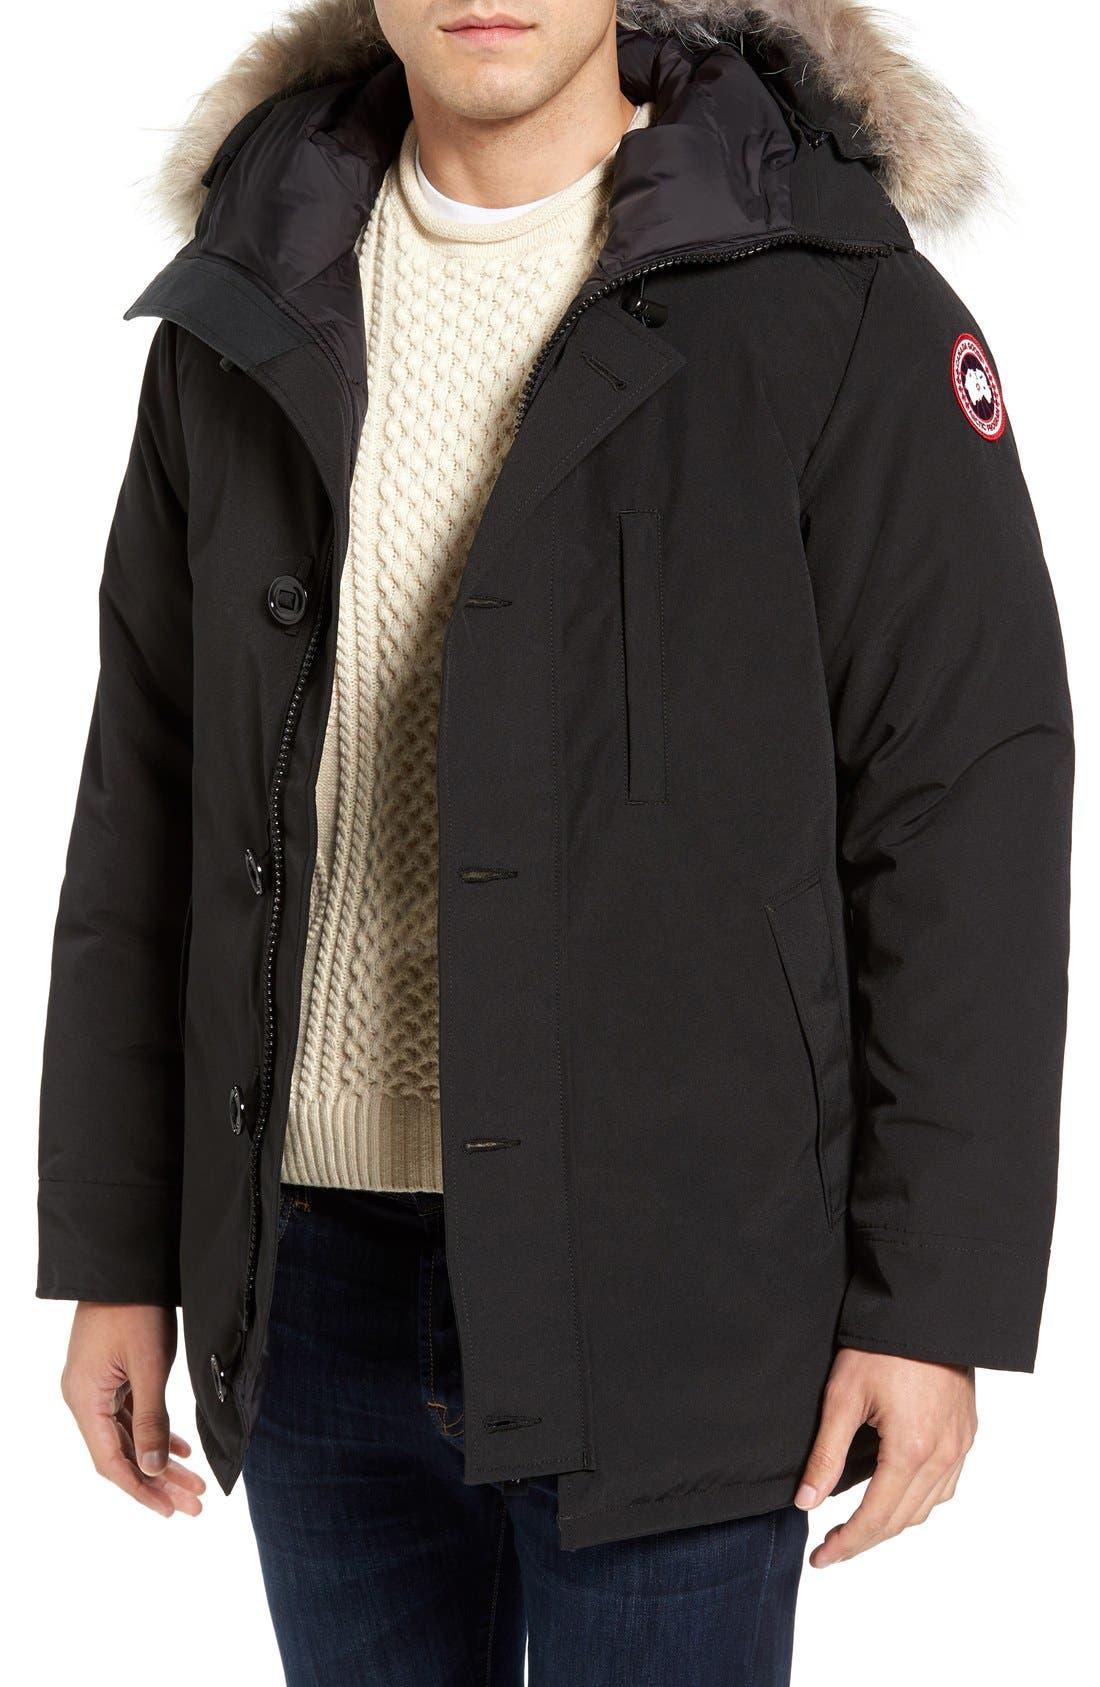 Alternate Image 1 Selected - Canada Goose 'Chateau' Slim Fit Genuine Coyote Fur Trim Jacket